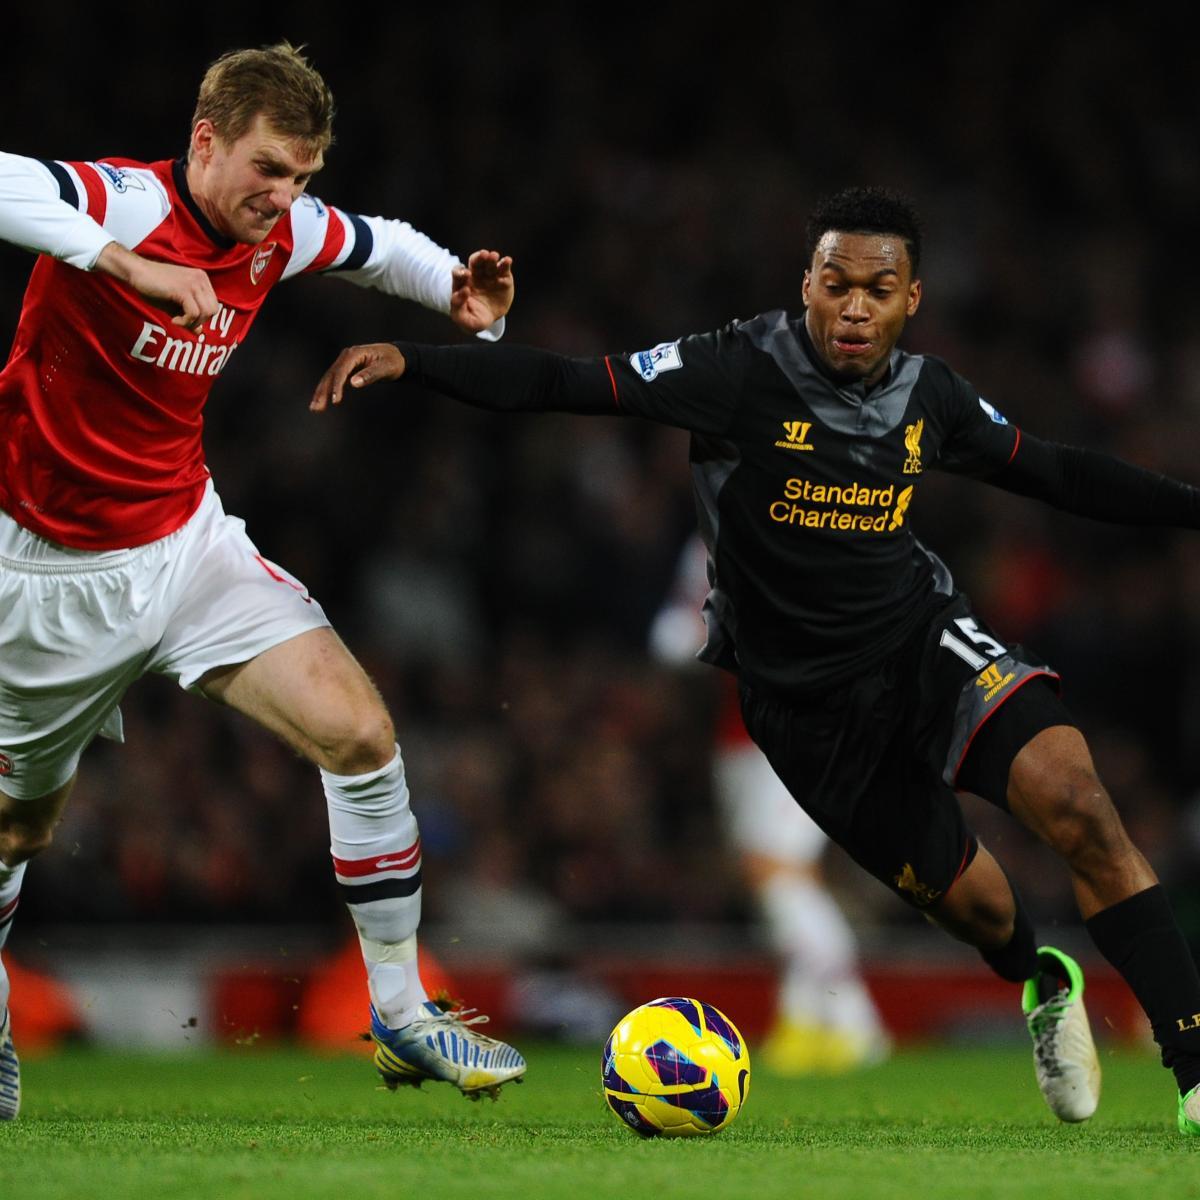 Live Streaming Soccer News Liverpool Vs Benfica Live: Arsenal Vs. Liverpool: Date, Time, Live Stream, TV Info